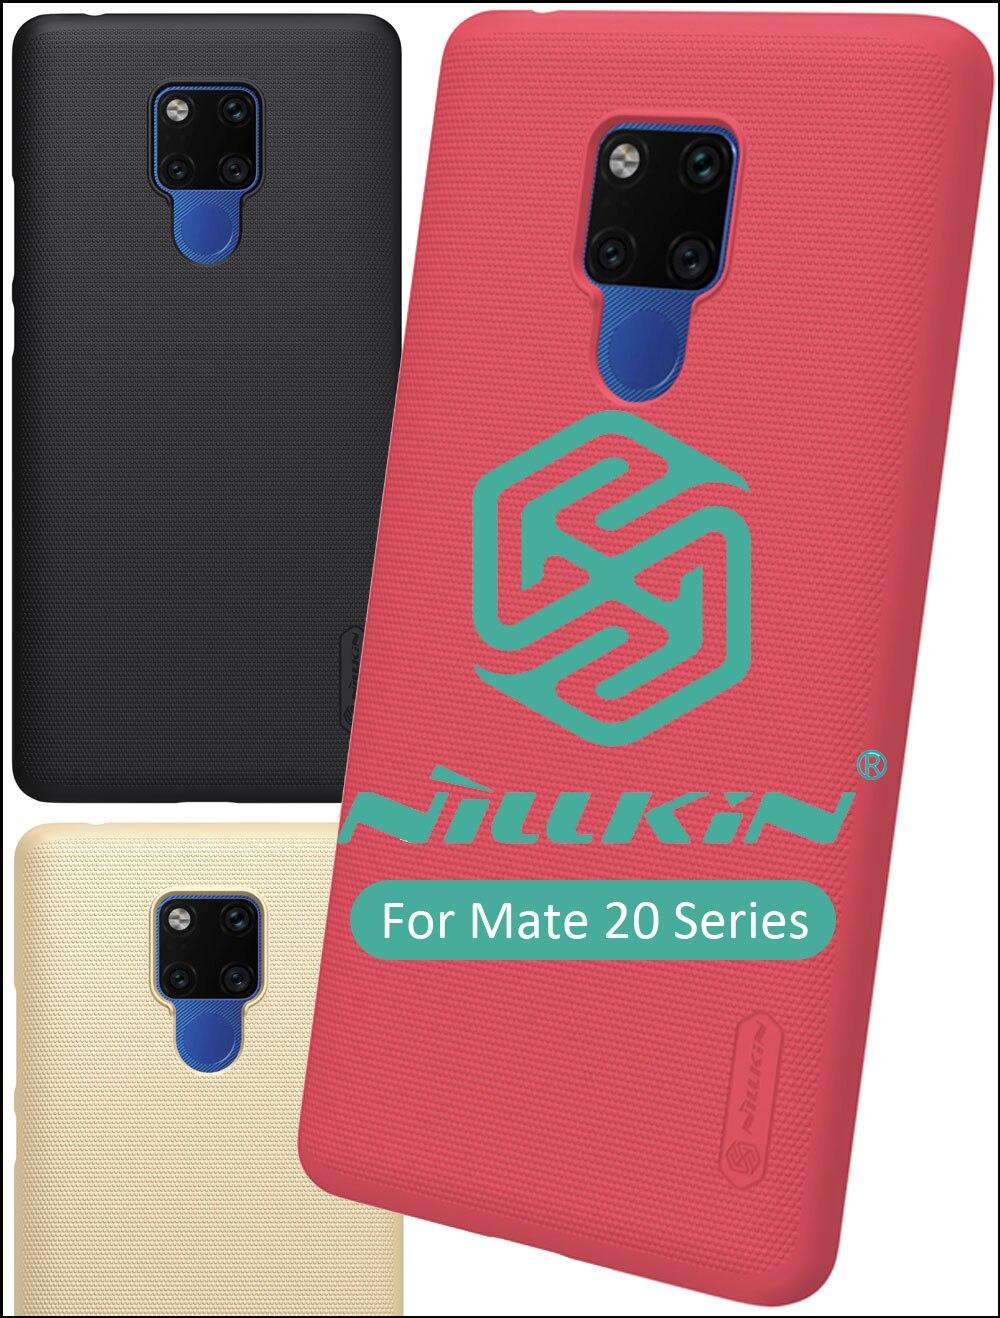 Funda Nillkin Frosted para Huawei Mate 20 Pro Lite X funda trasera de plástico duro + soporte de regalo